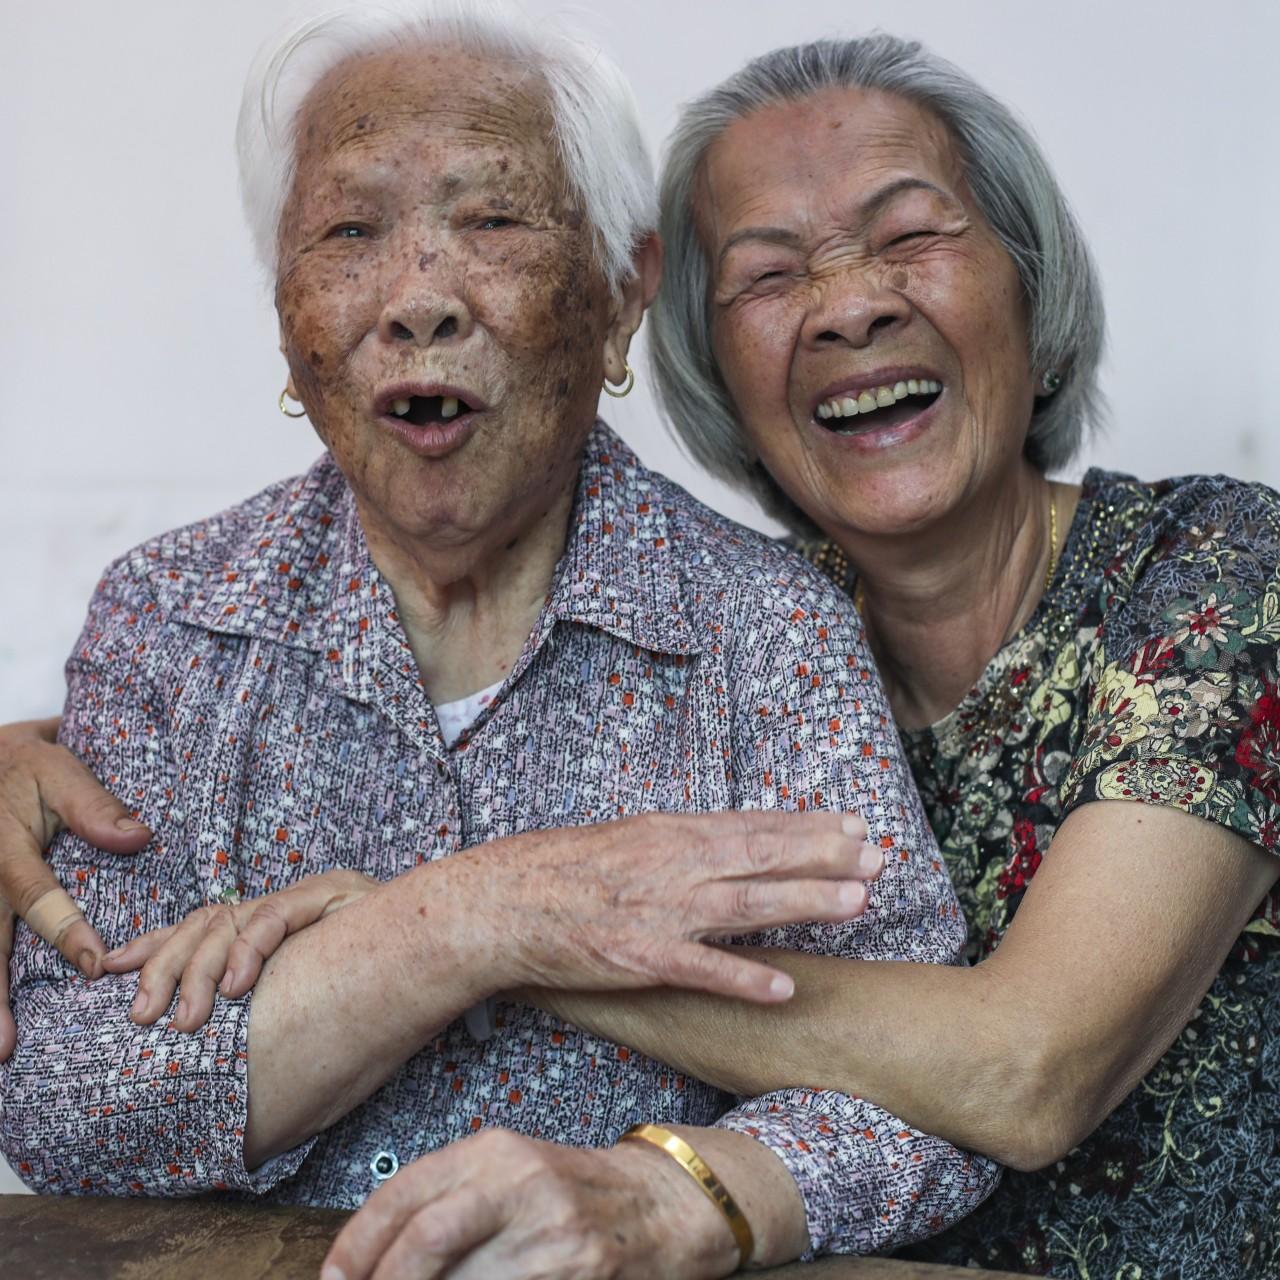 Hong Kong arranged marriage heartbreak: the bridal laments women